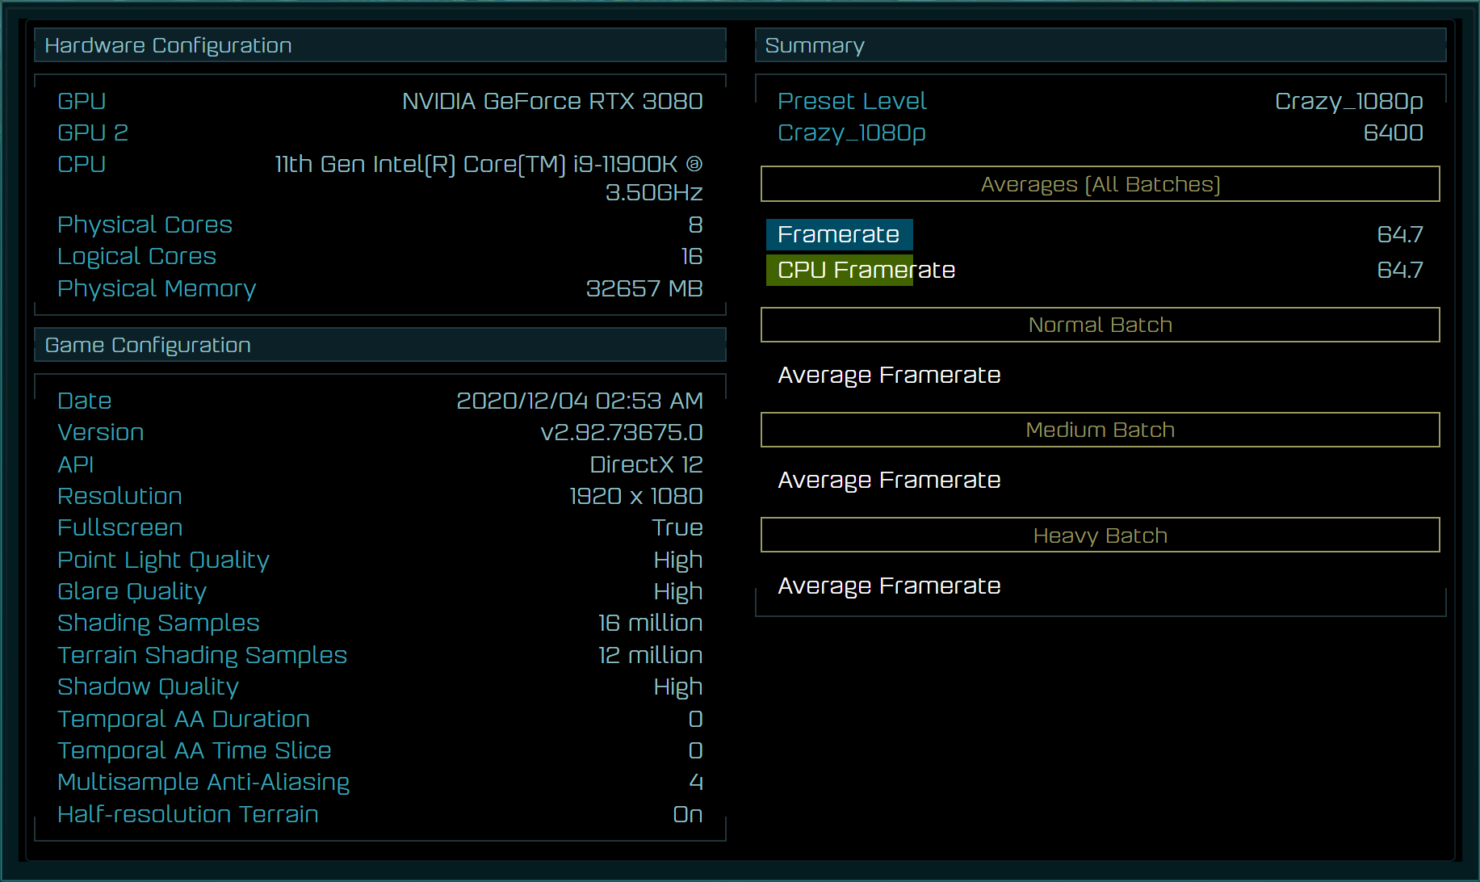 intel-core-i9-11900k-rocket-lake-8-core-desktop-cpu-performance-benchmark-leak-at-1080p